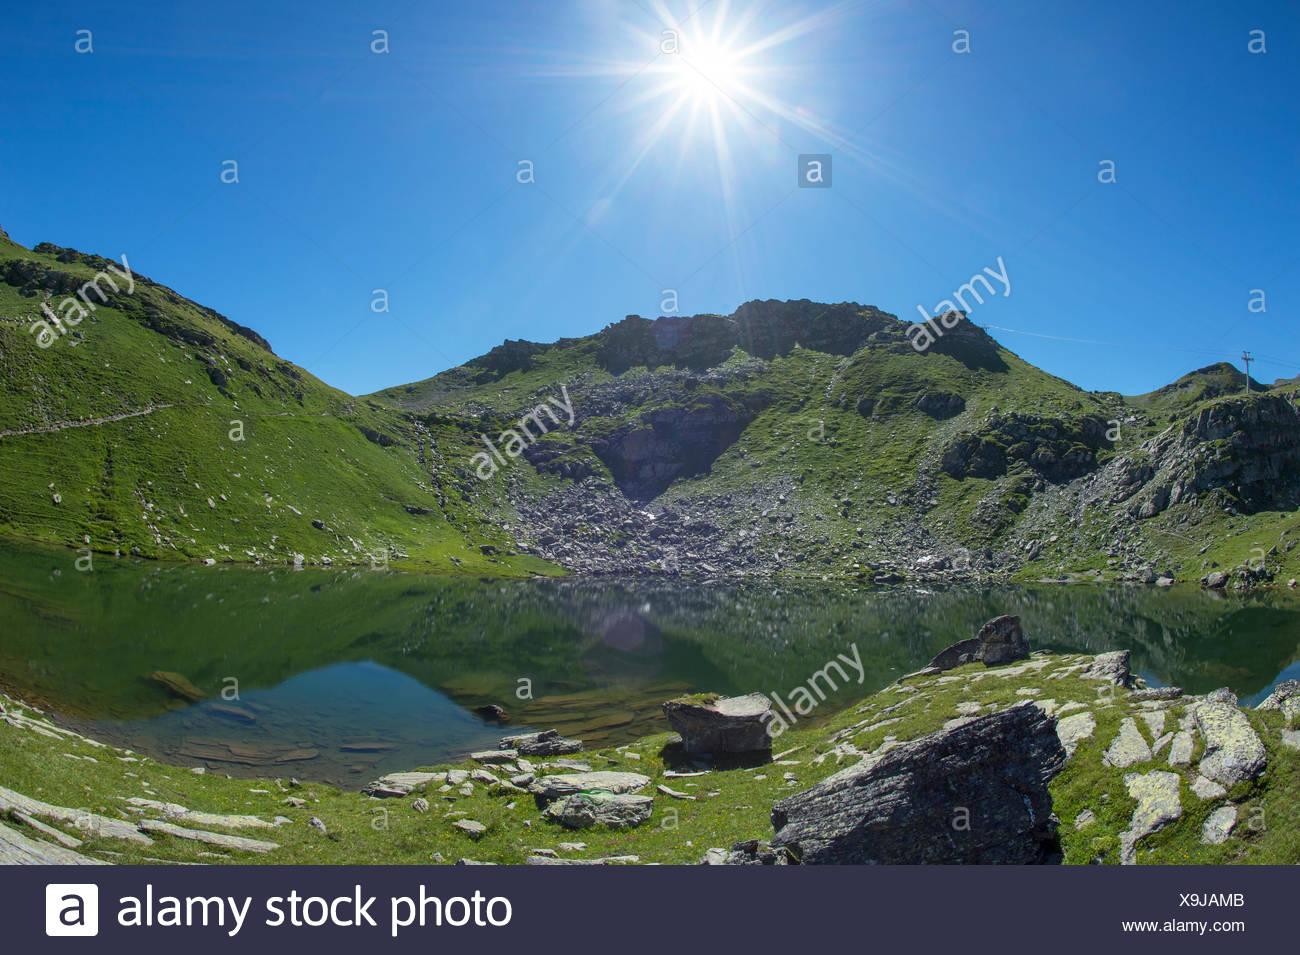 france, south-eastern france, alps, vanoise massif, ski resort les 3